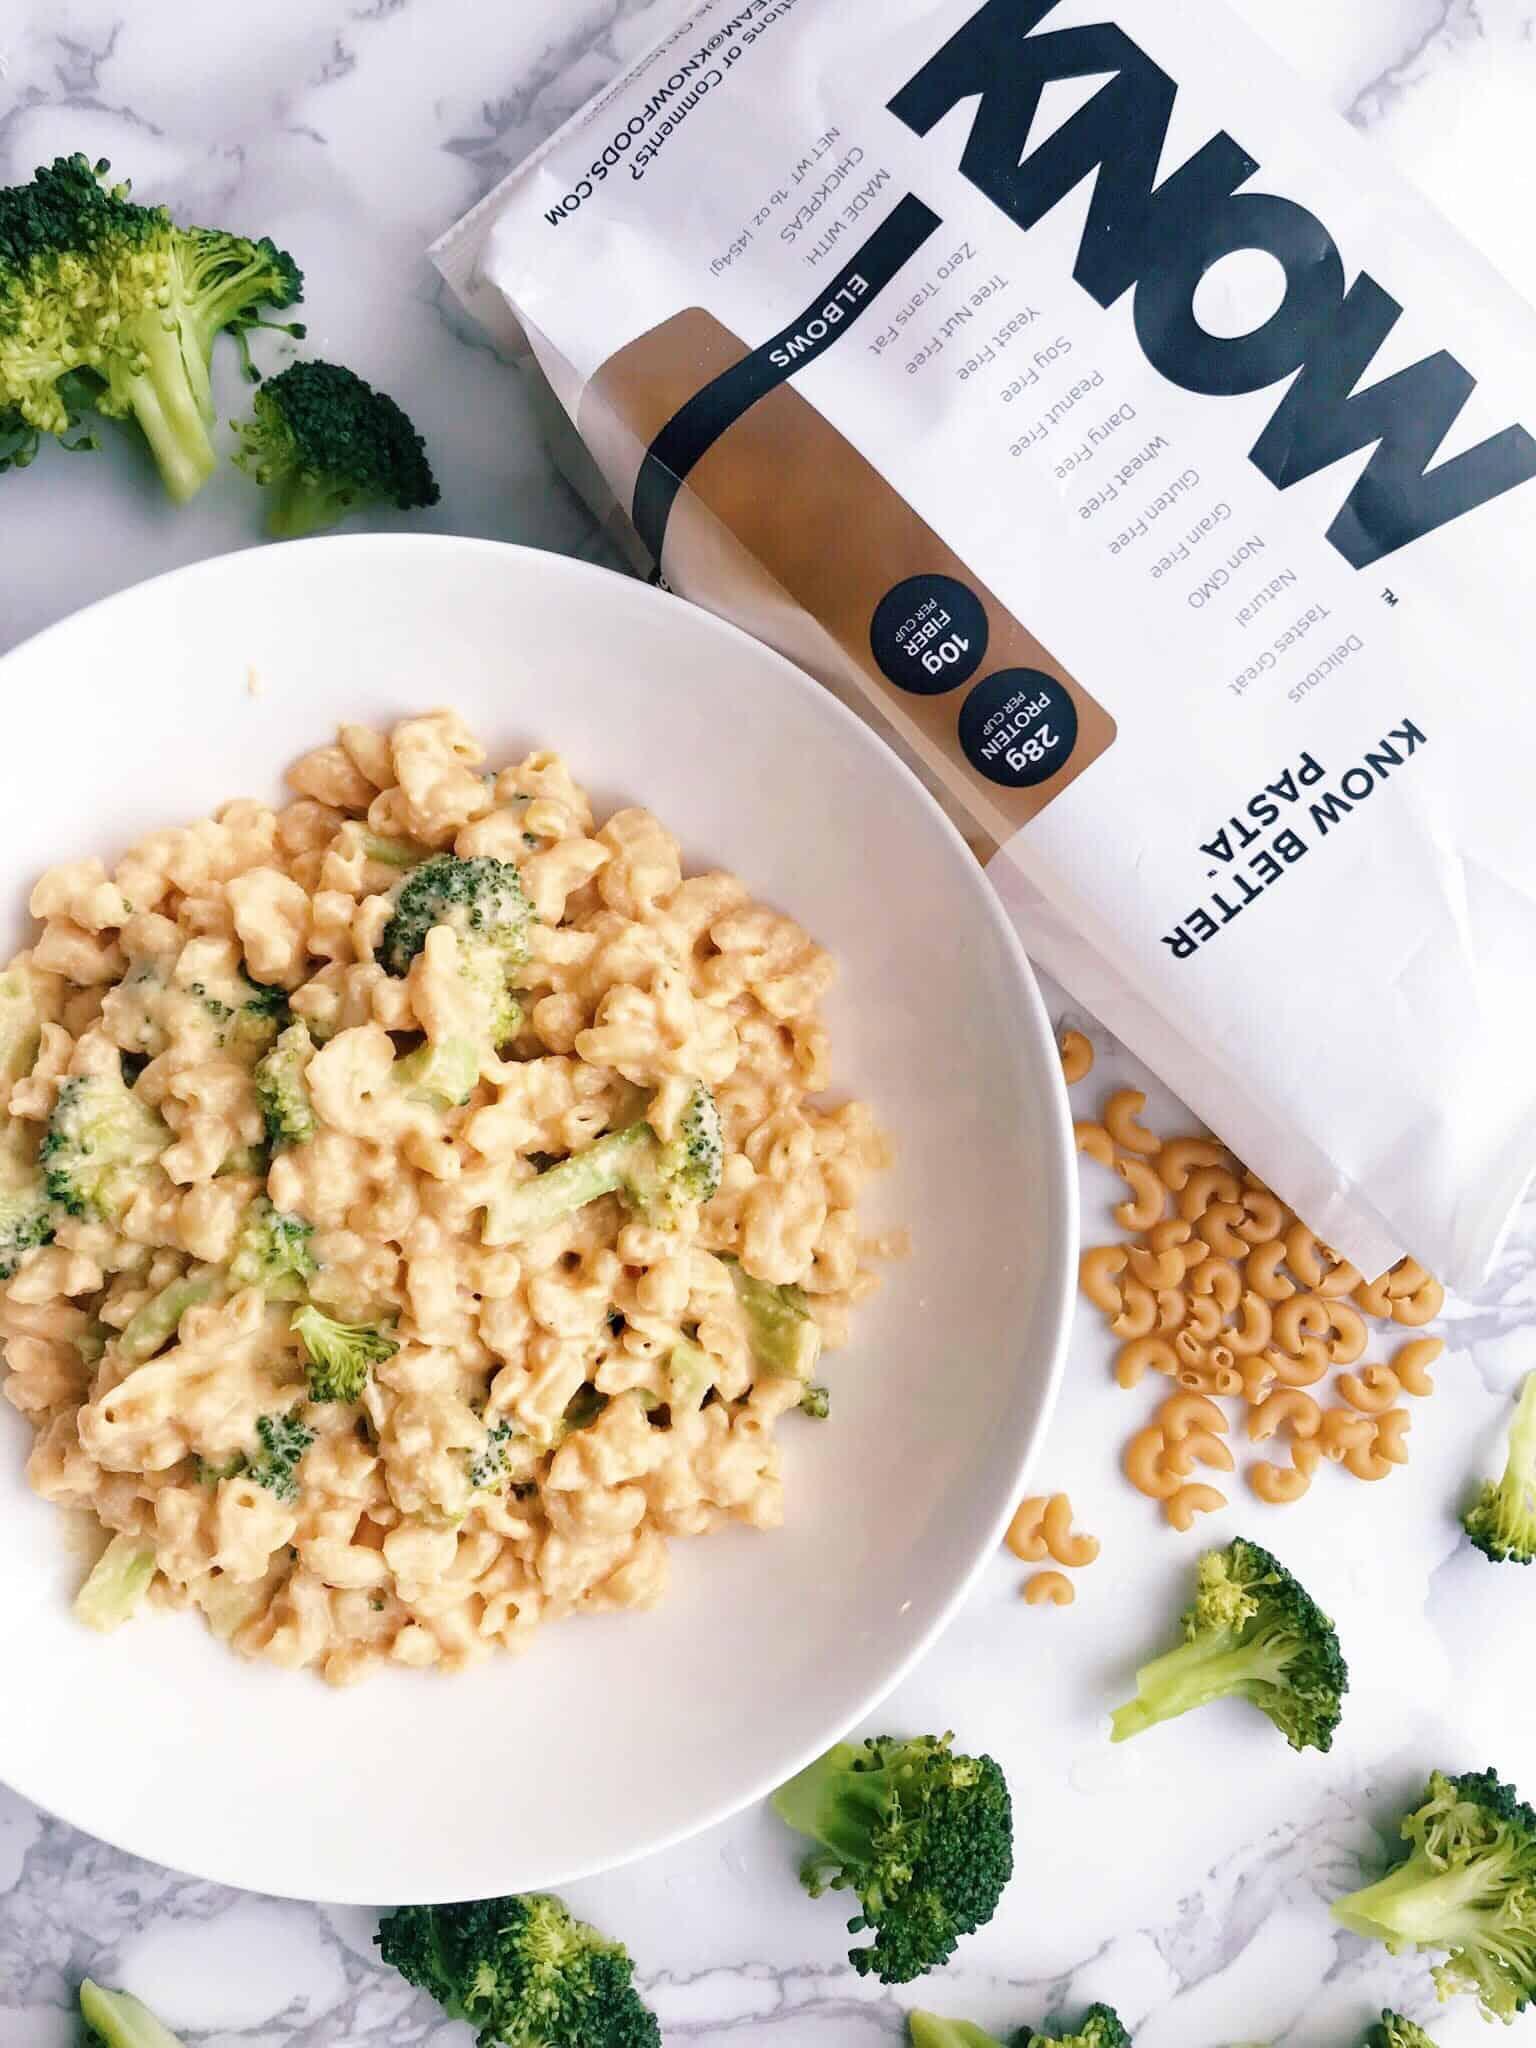 Our Super Easy + Cheesy Vegan Broccoli Mac